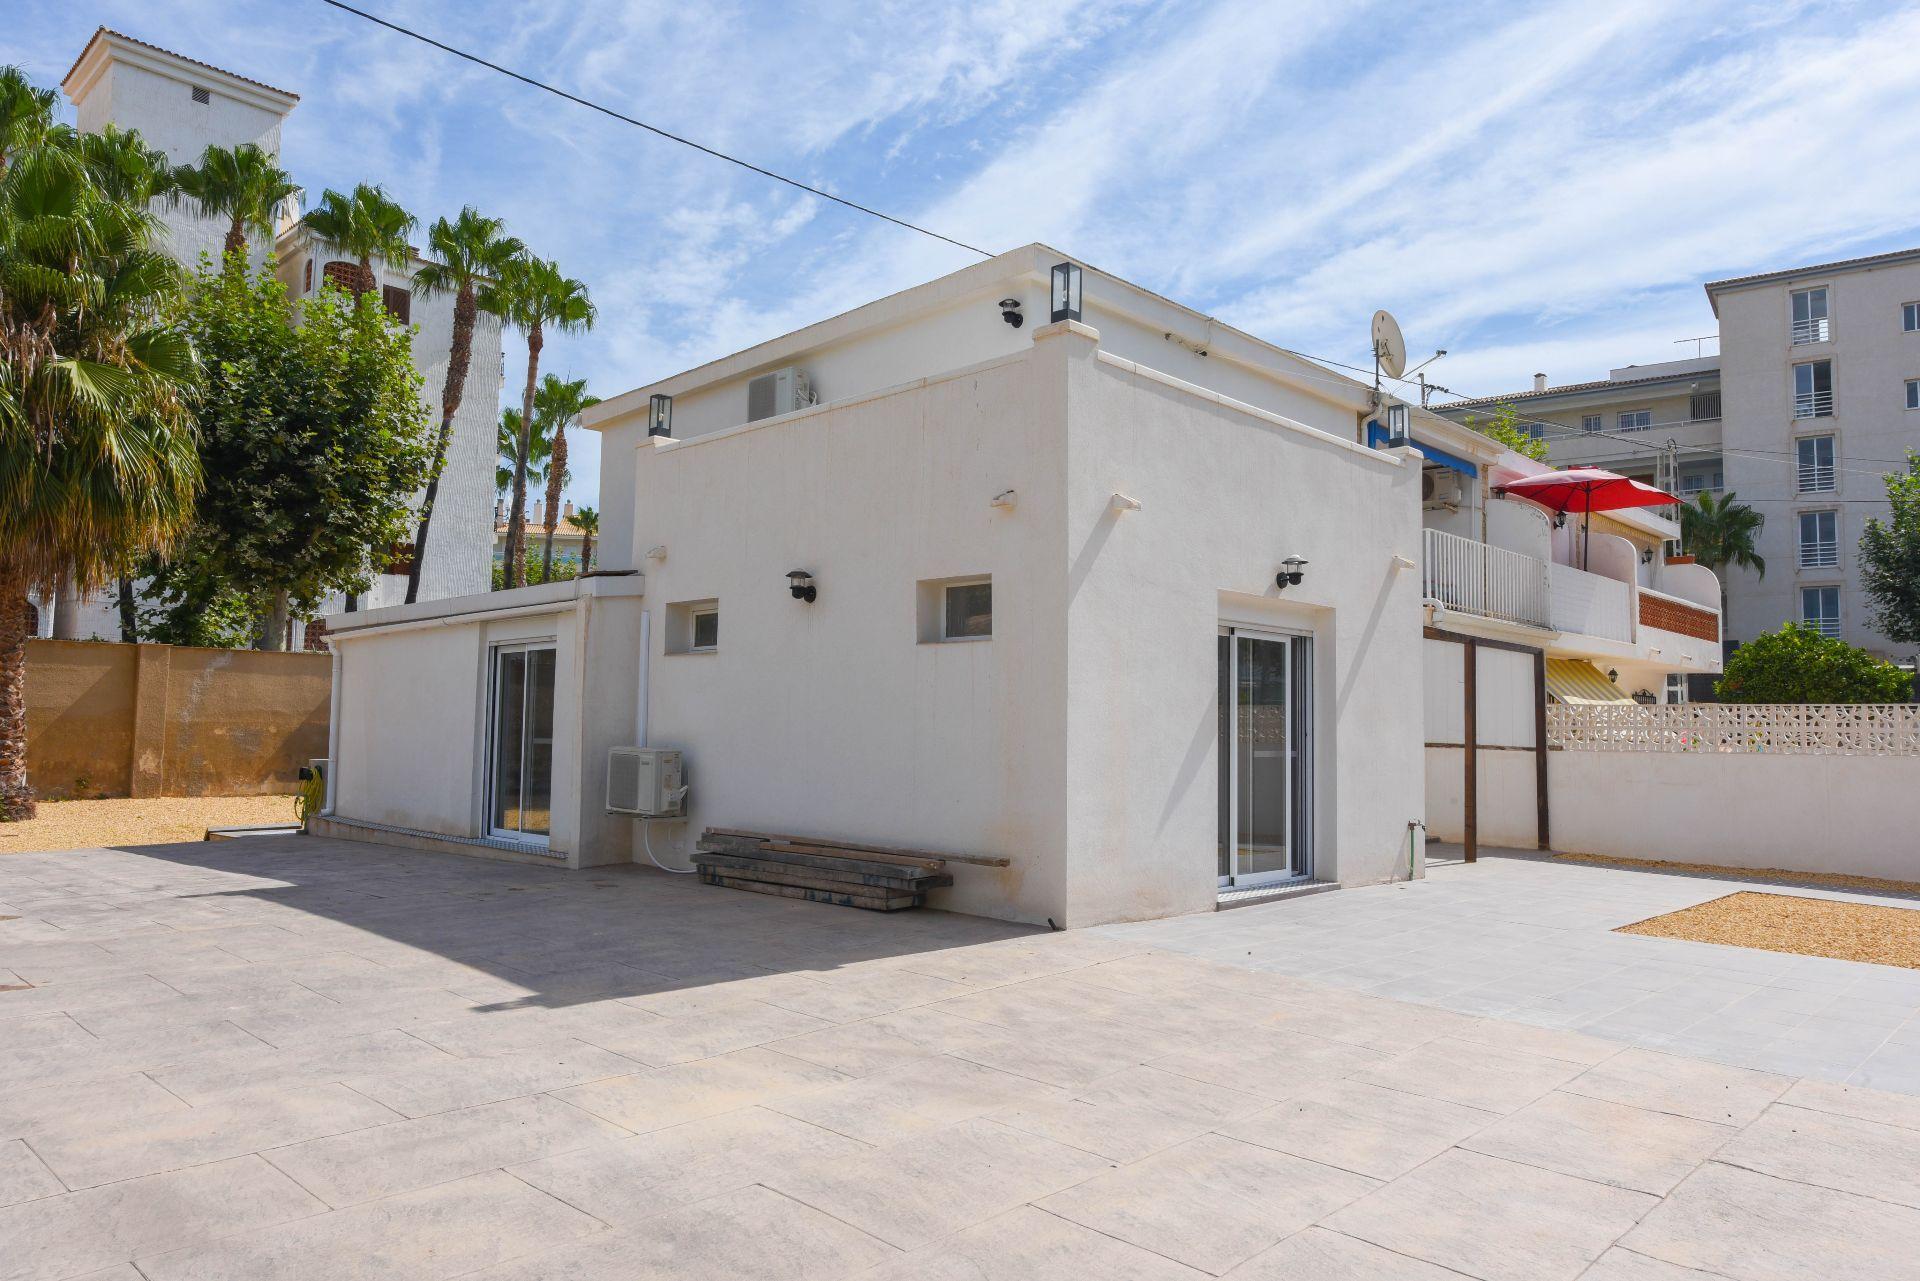 Terraced House in El Albir / L'Albir, for sale